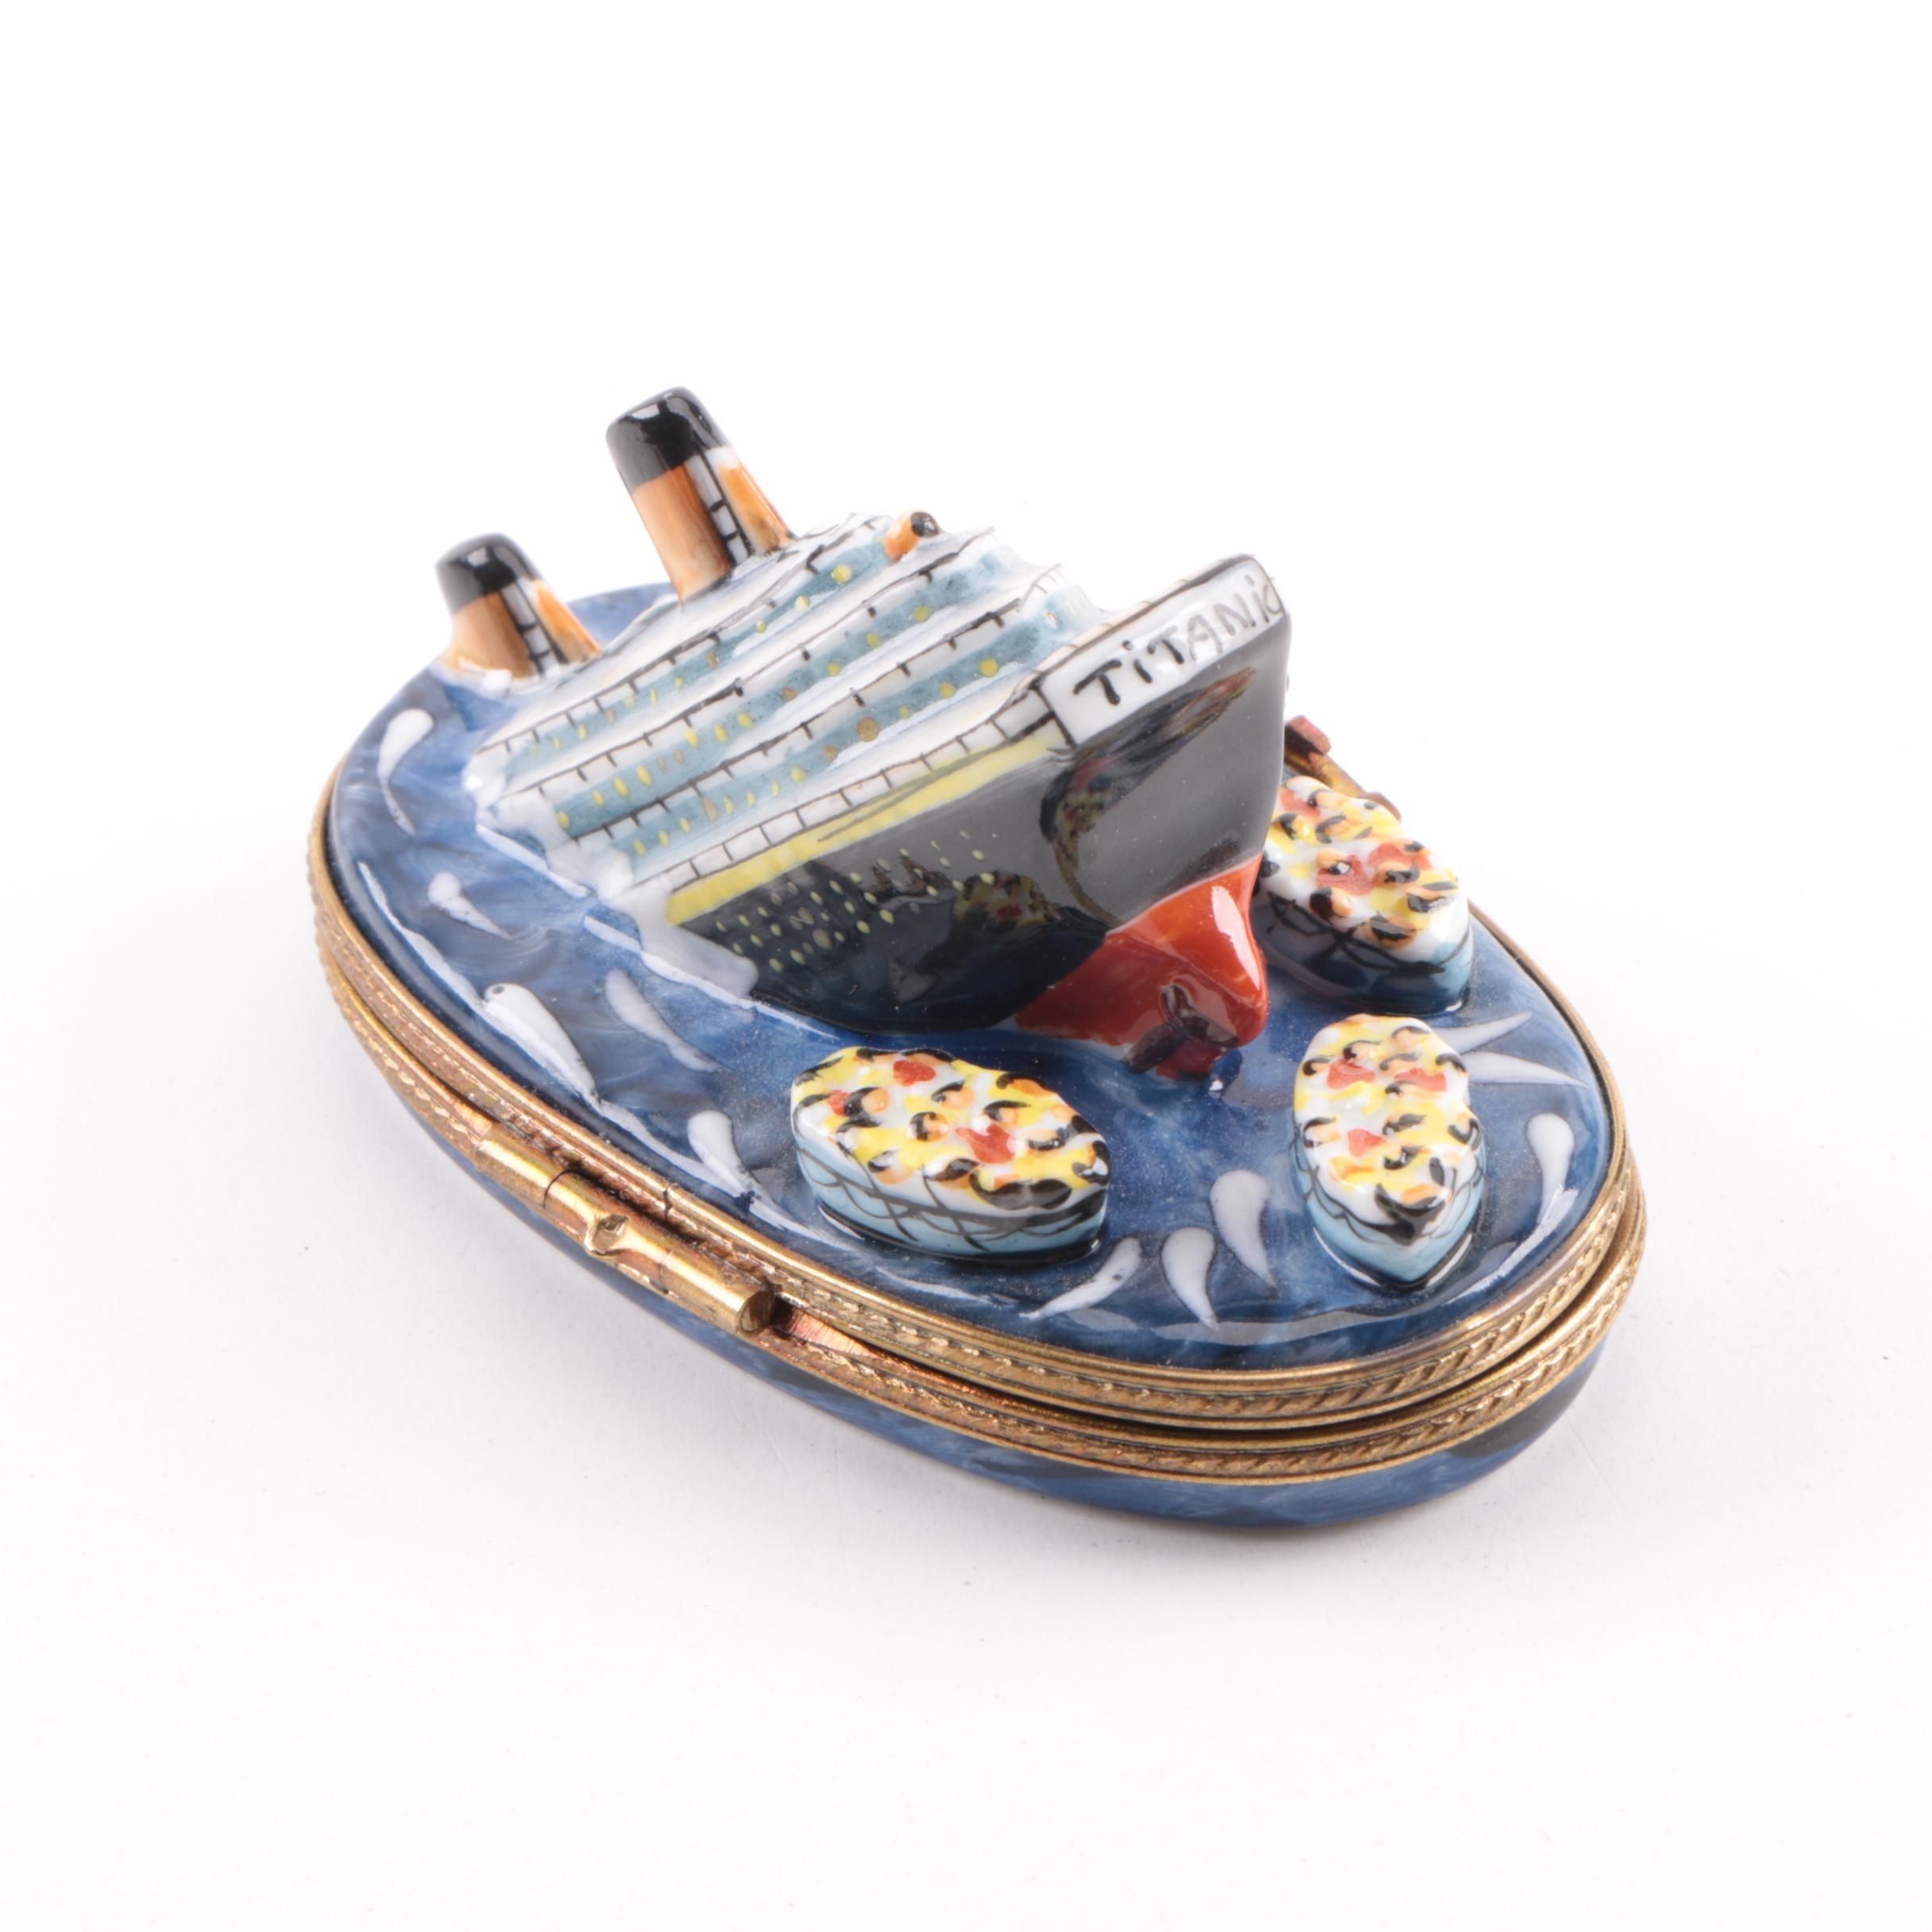 Limoges Limited Edition Titanic-Themed Porcelain Trinket Box